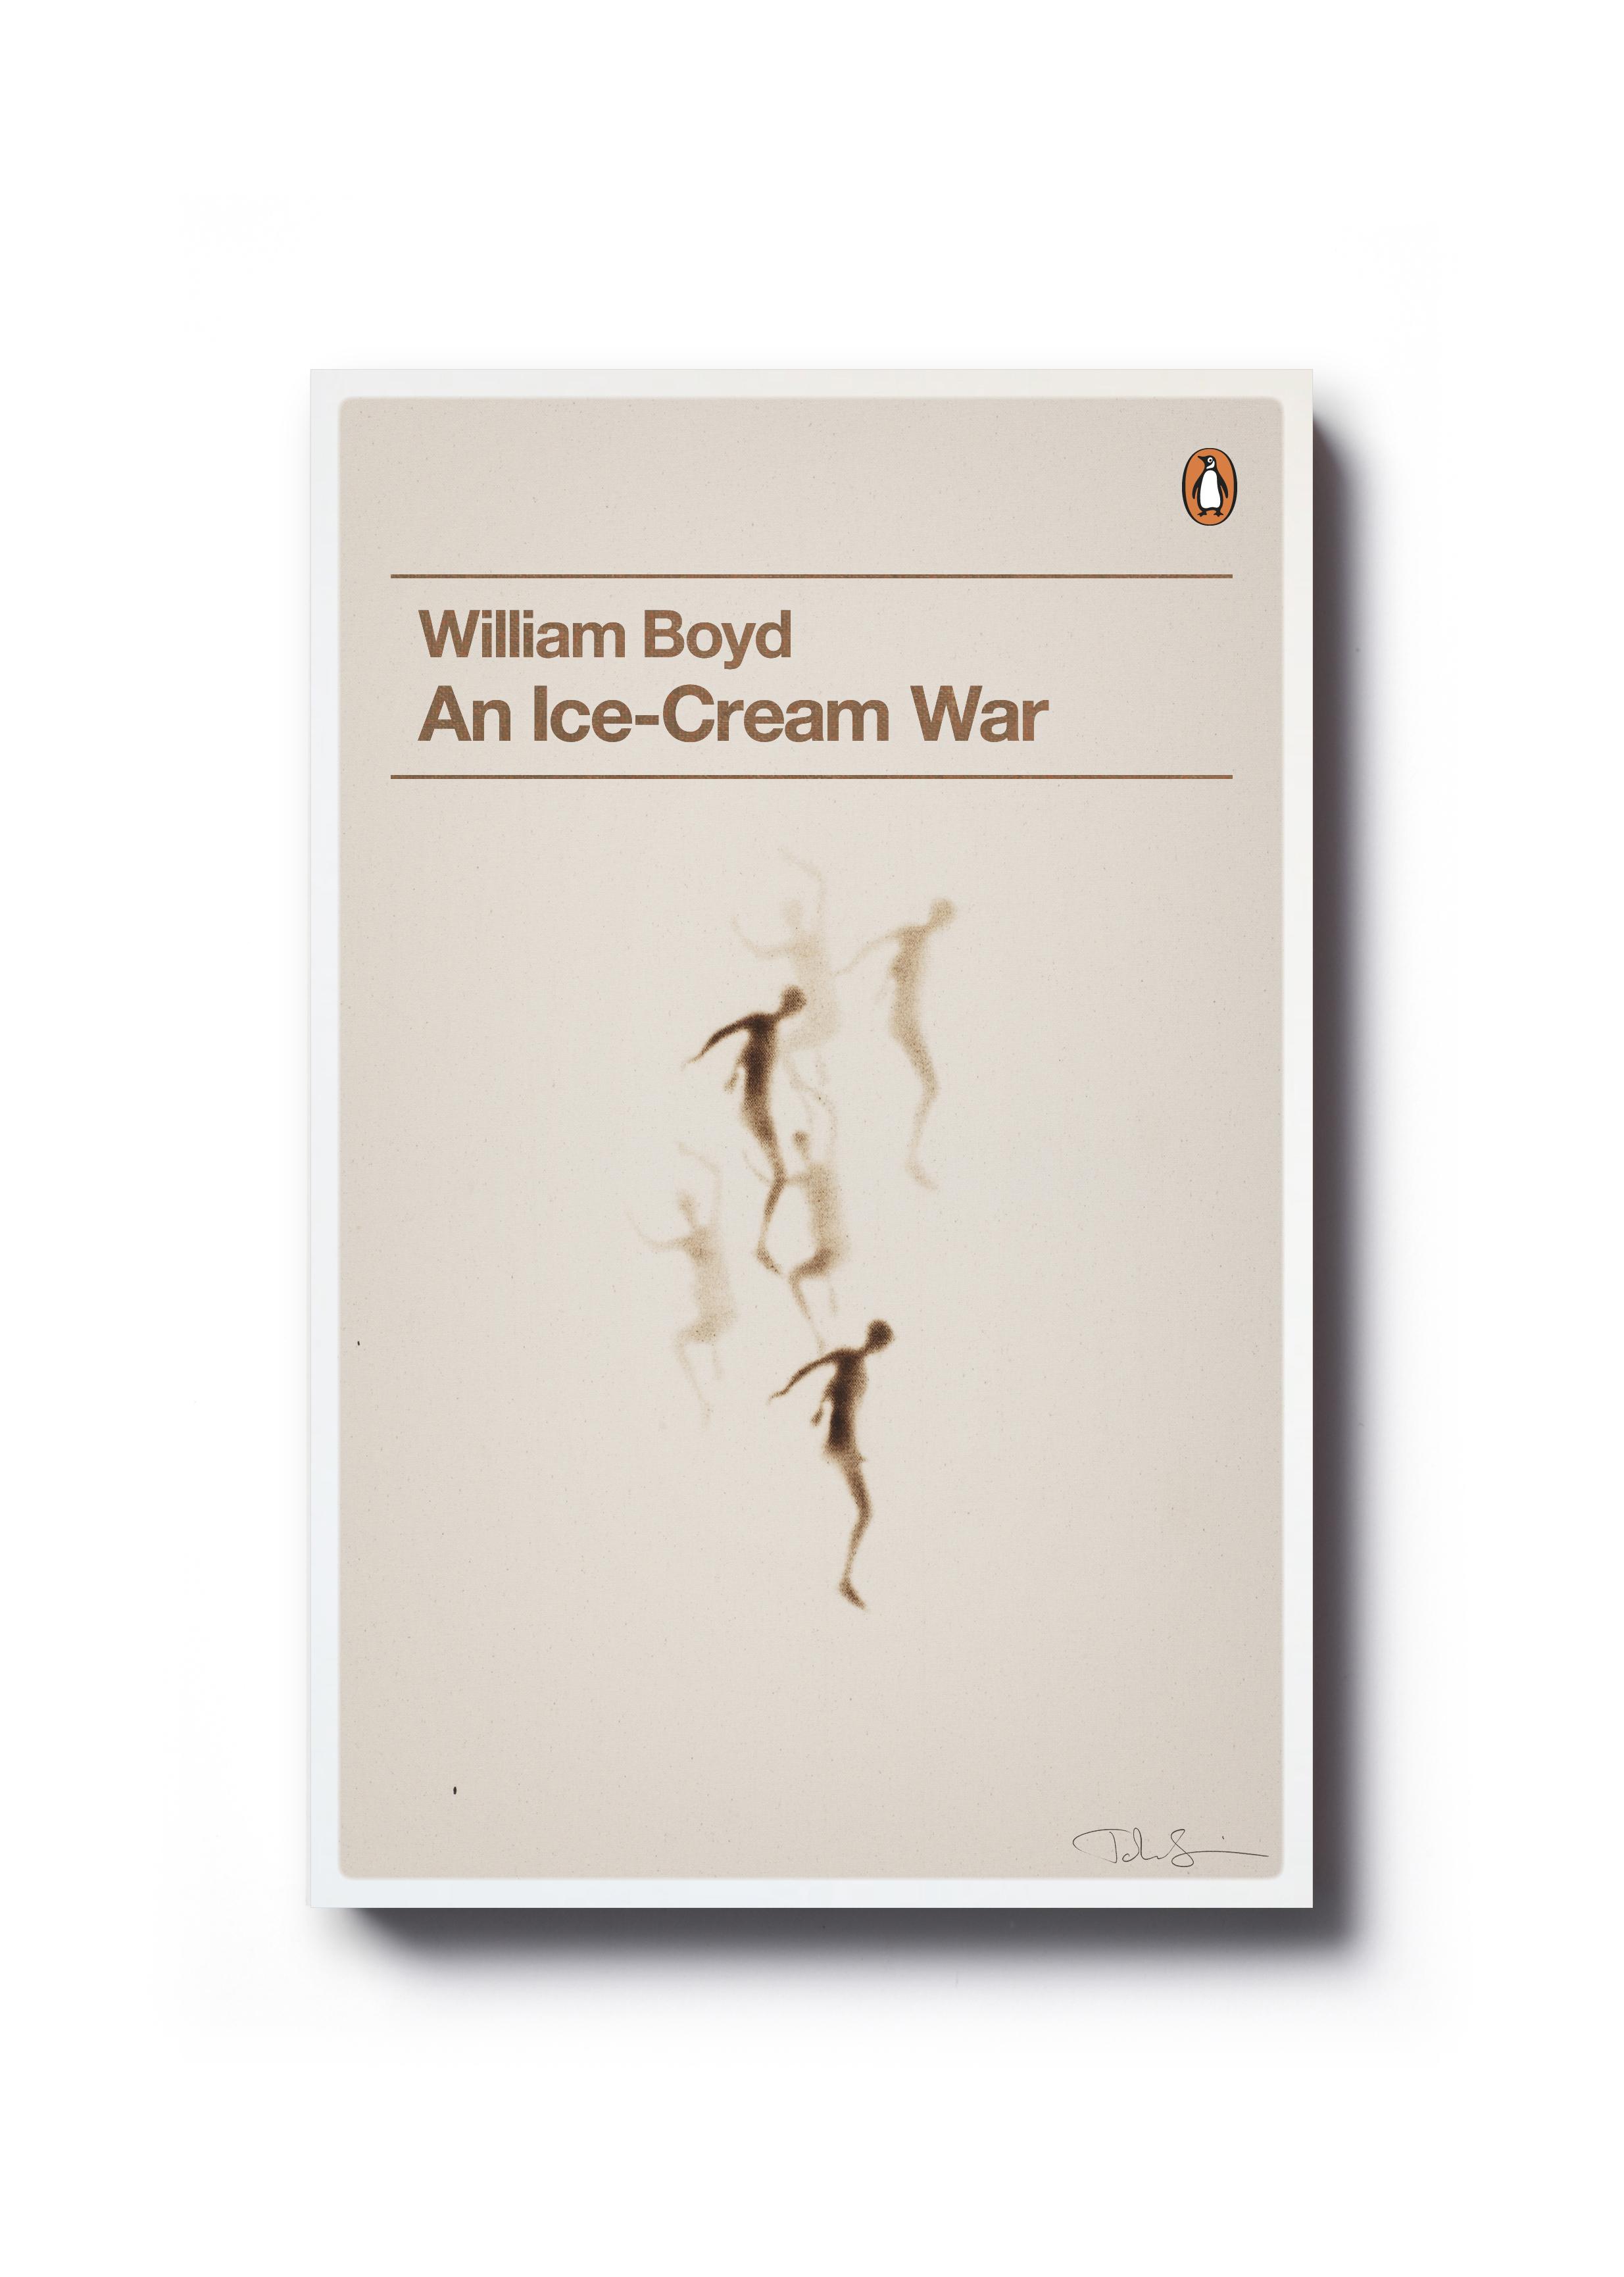 An Ice-Cream War by William Boyd (Penguin Decades series) - Art: John Squire Design: Jim Stoddart